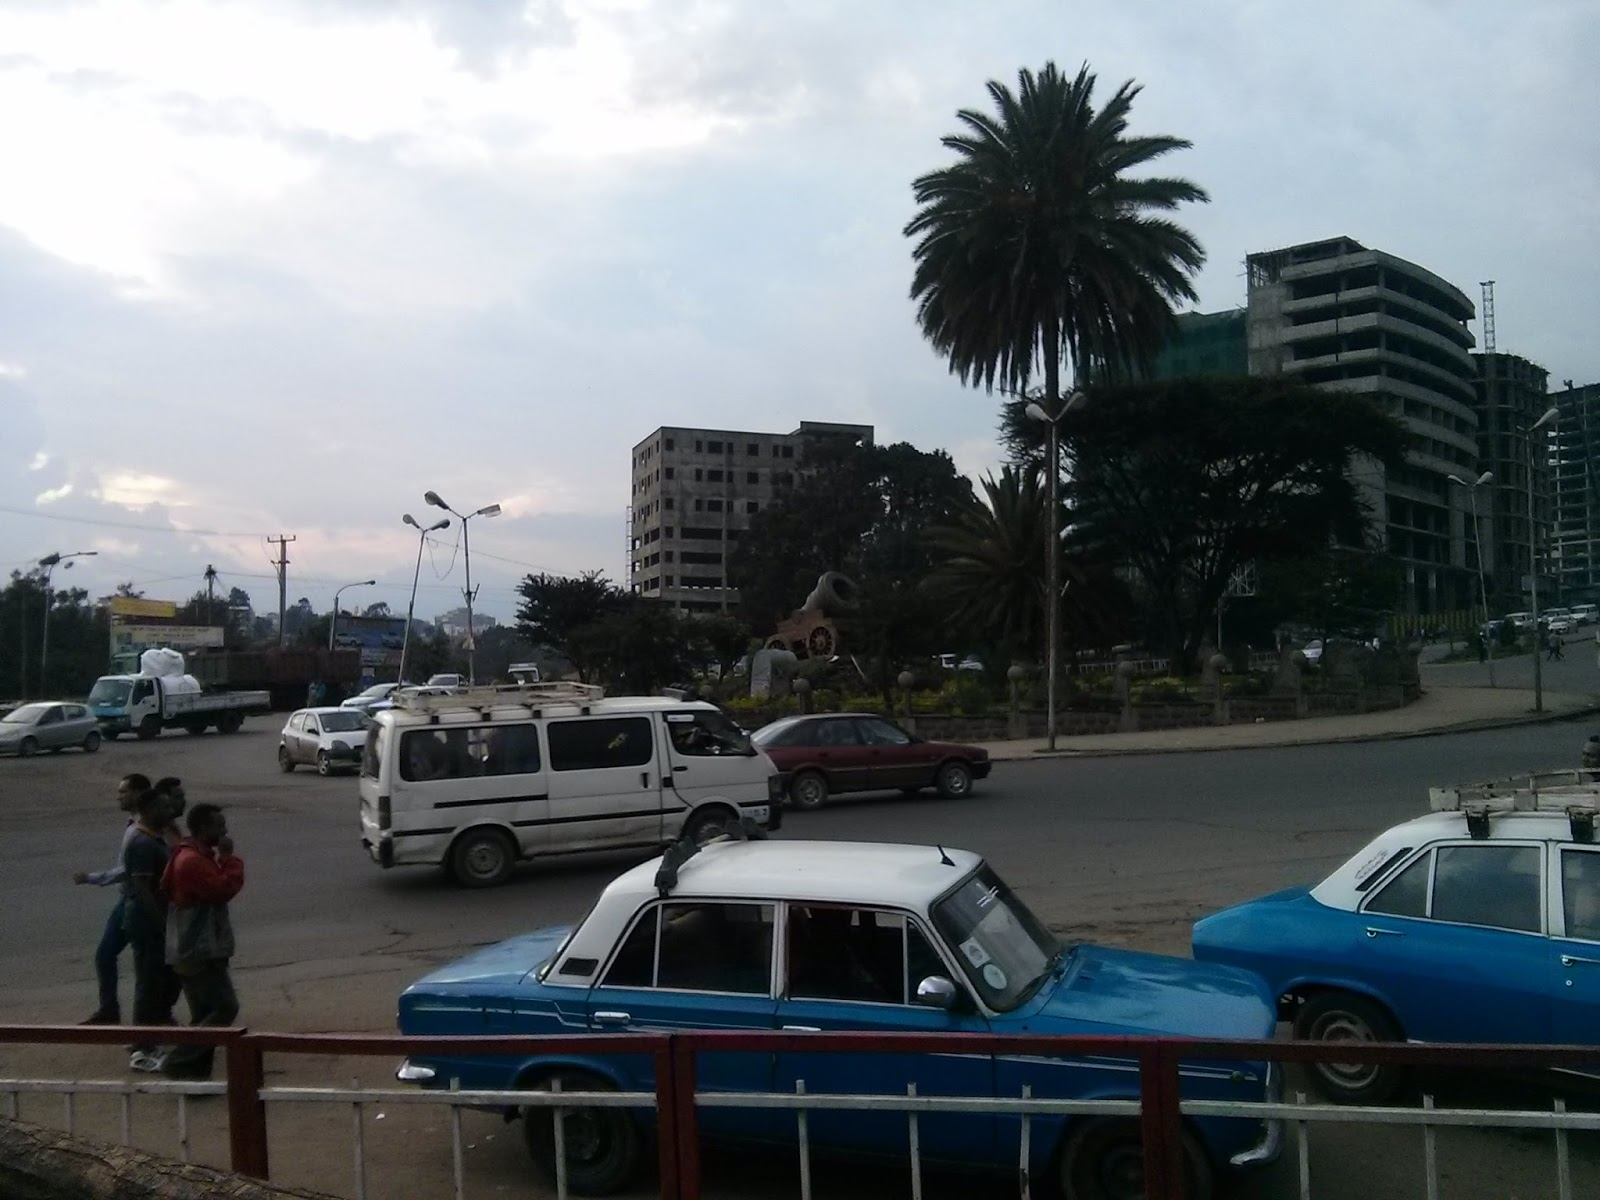 A Kenyan in Addis Ababa (Part 1)